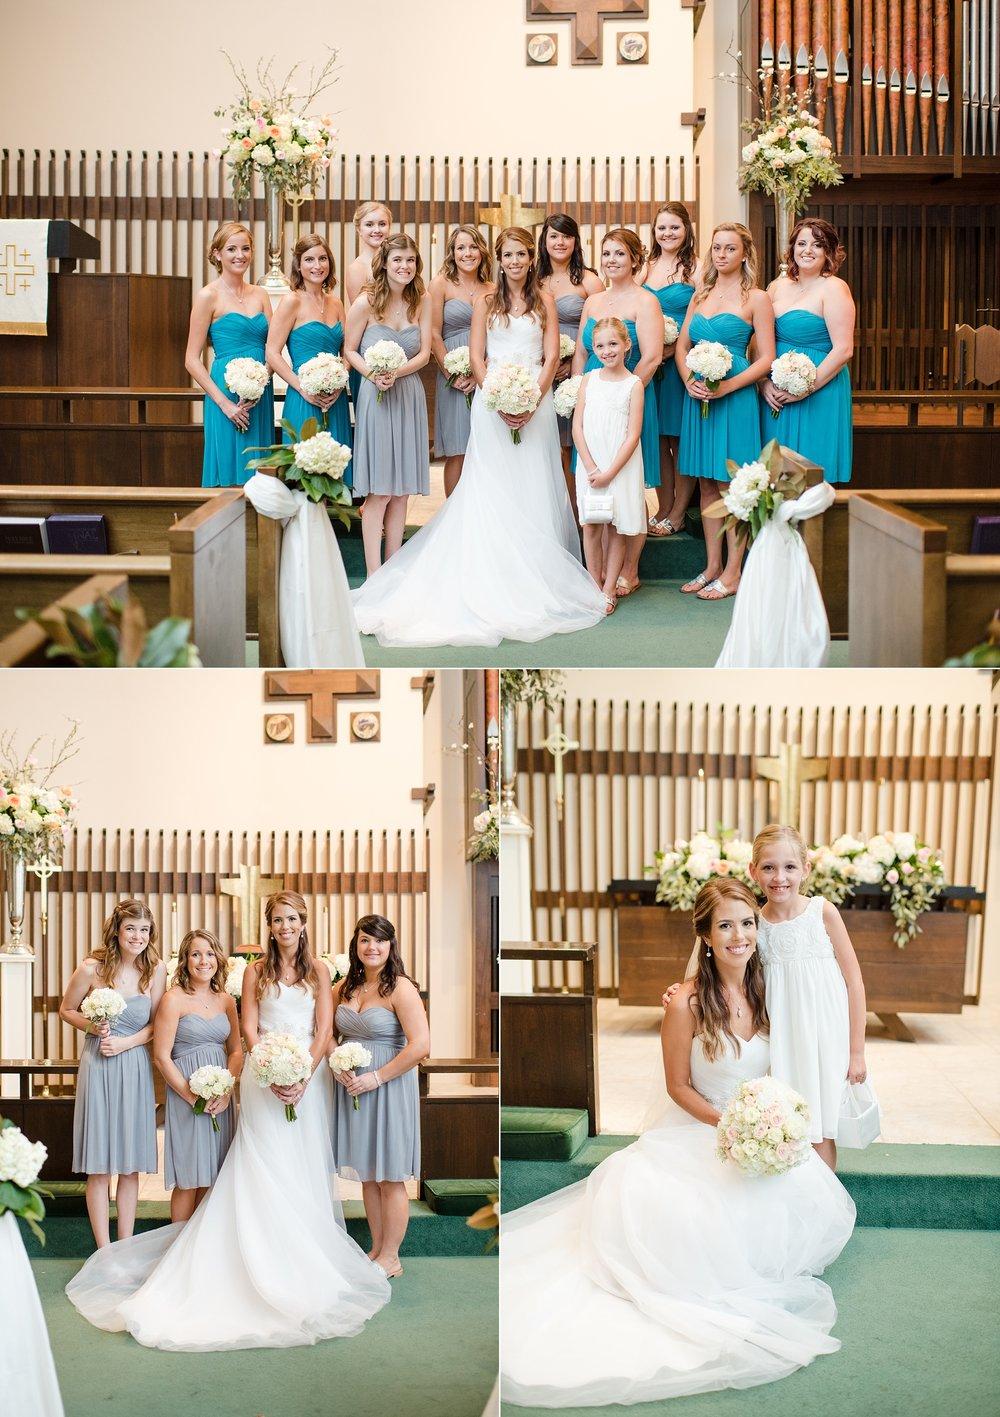 new_bern_nc_wedding_photographer_0024.jpg